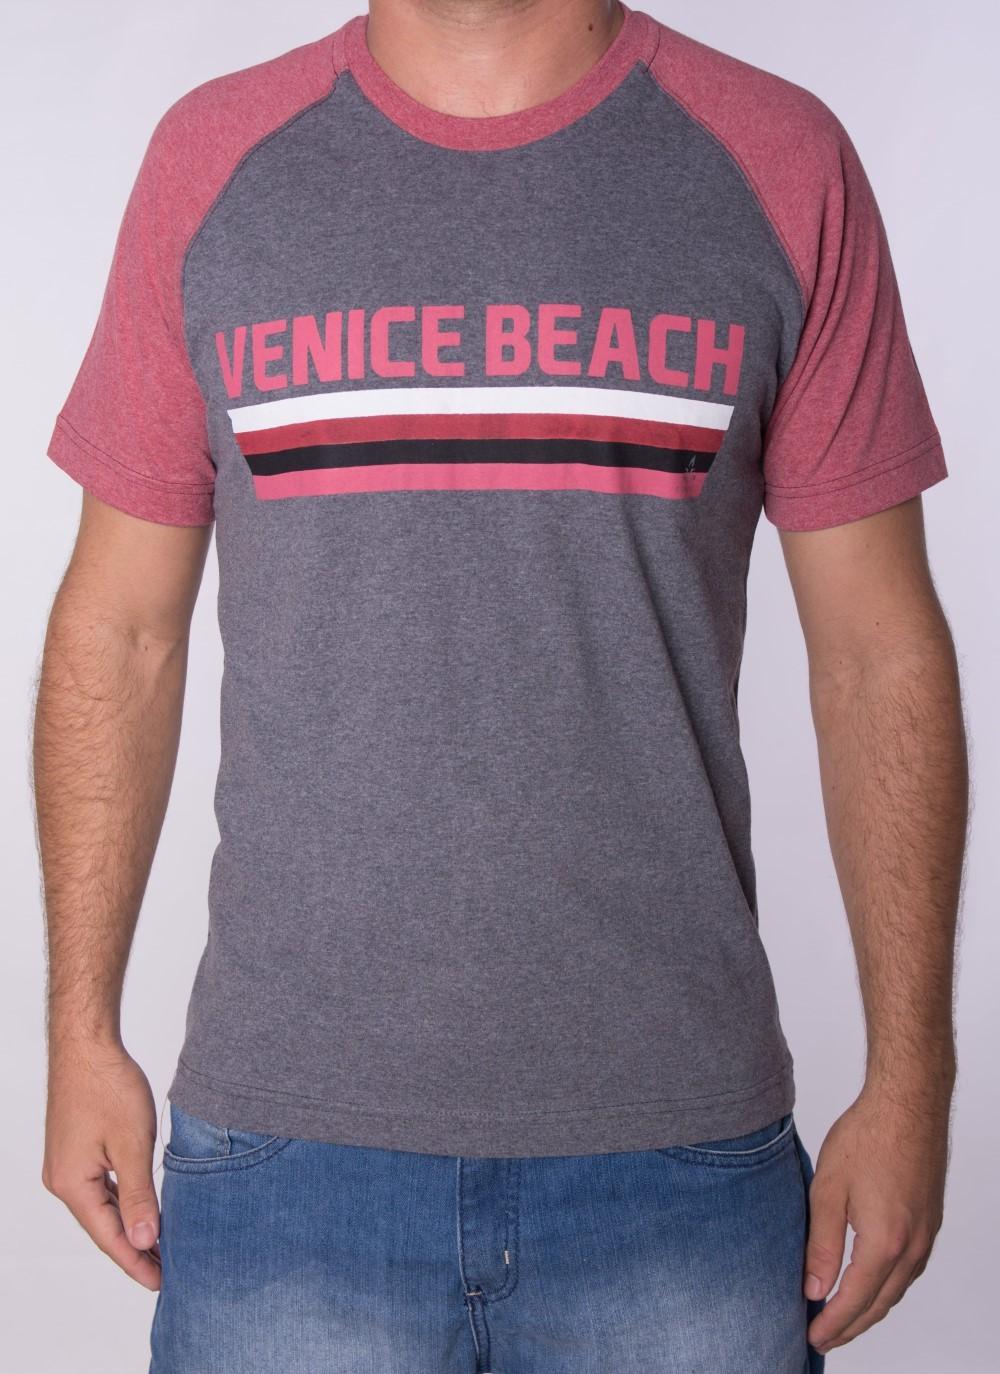 Camiseta Barrocco Praia de Venice